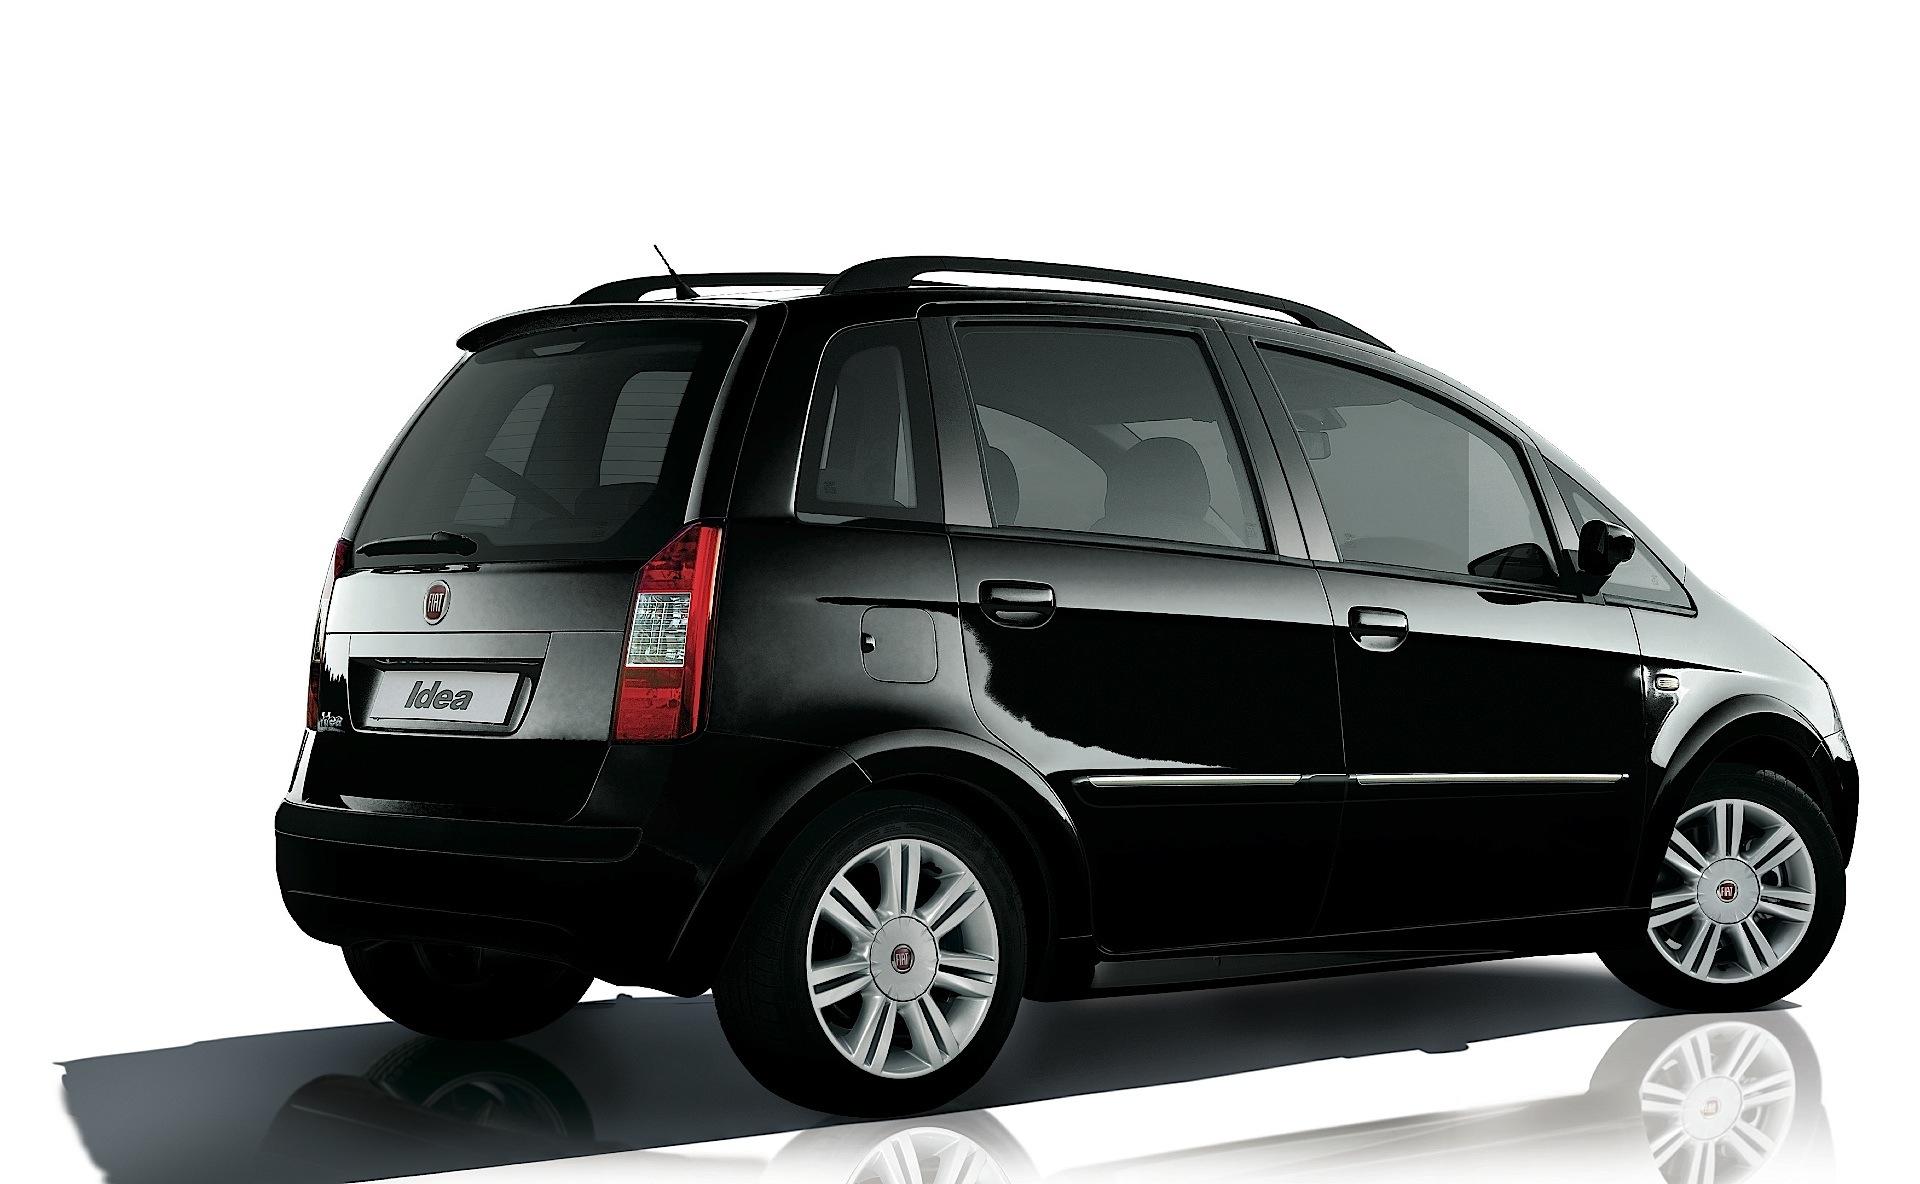 FIAT Idea specs & photos - 2010, 2011, 2012, 2013, 2014 ...